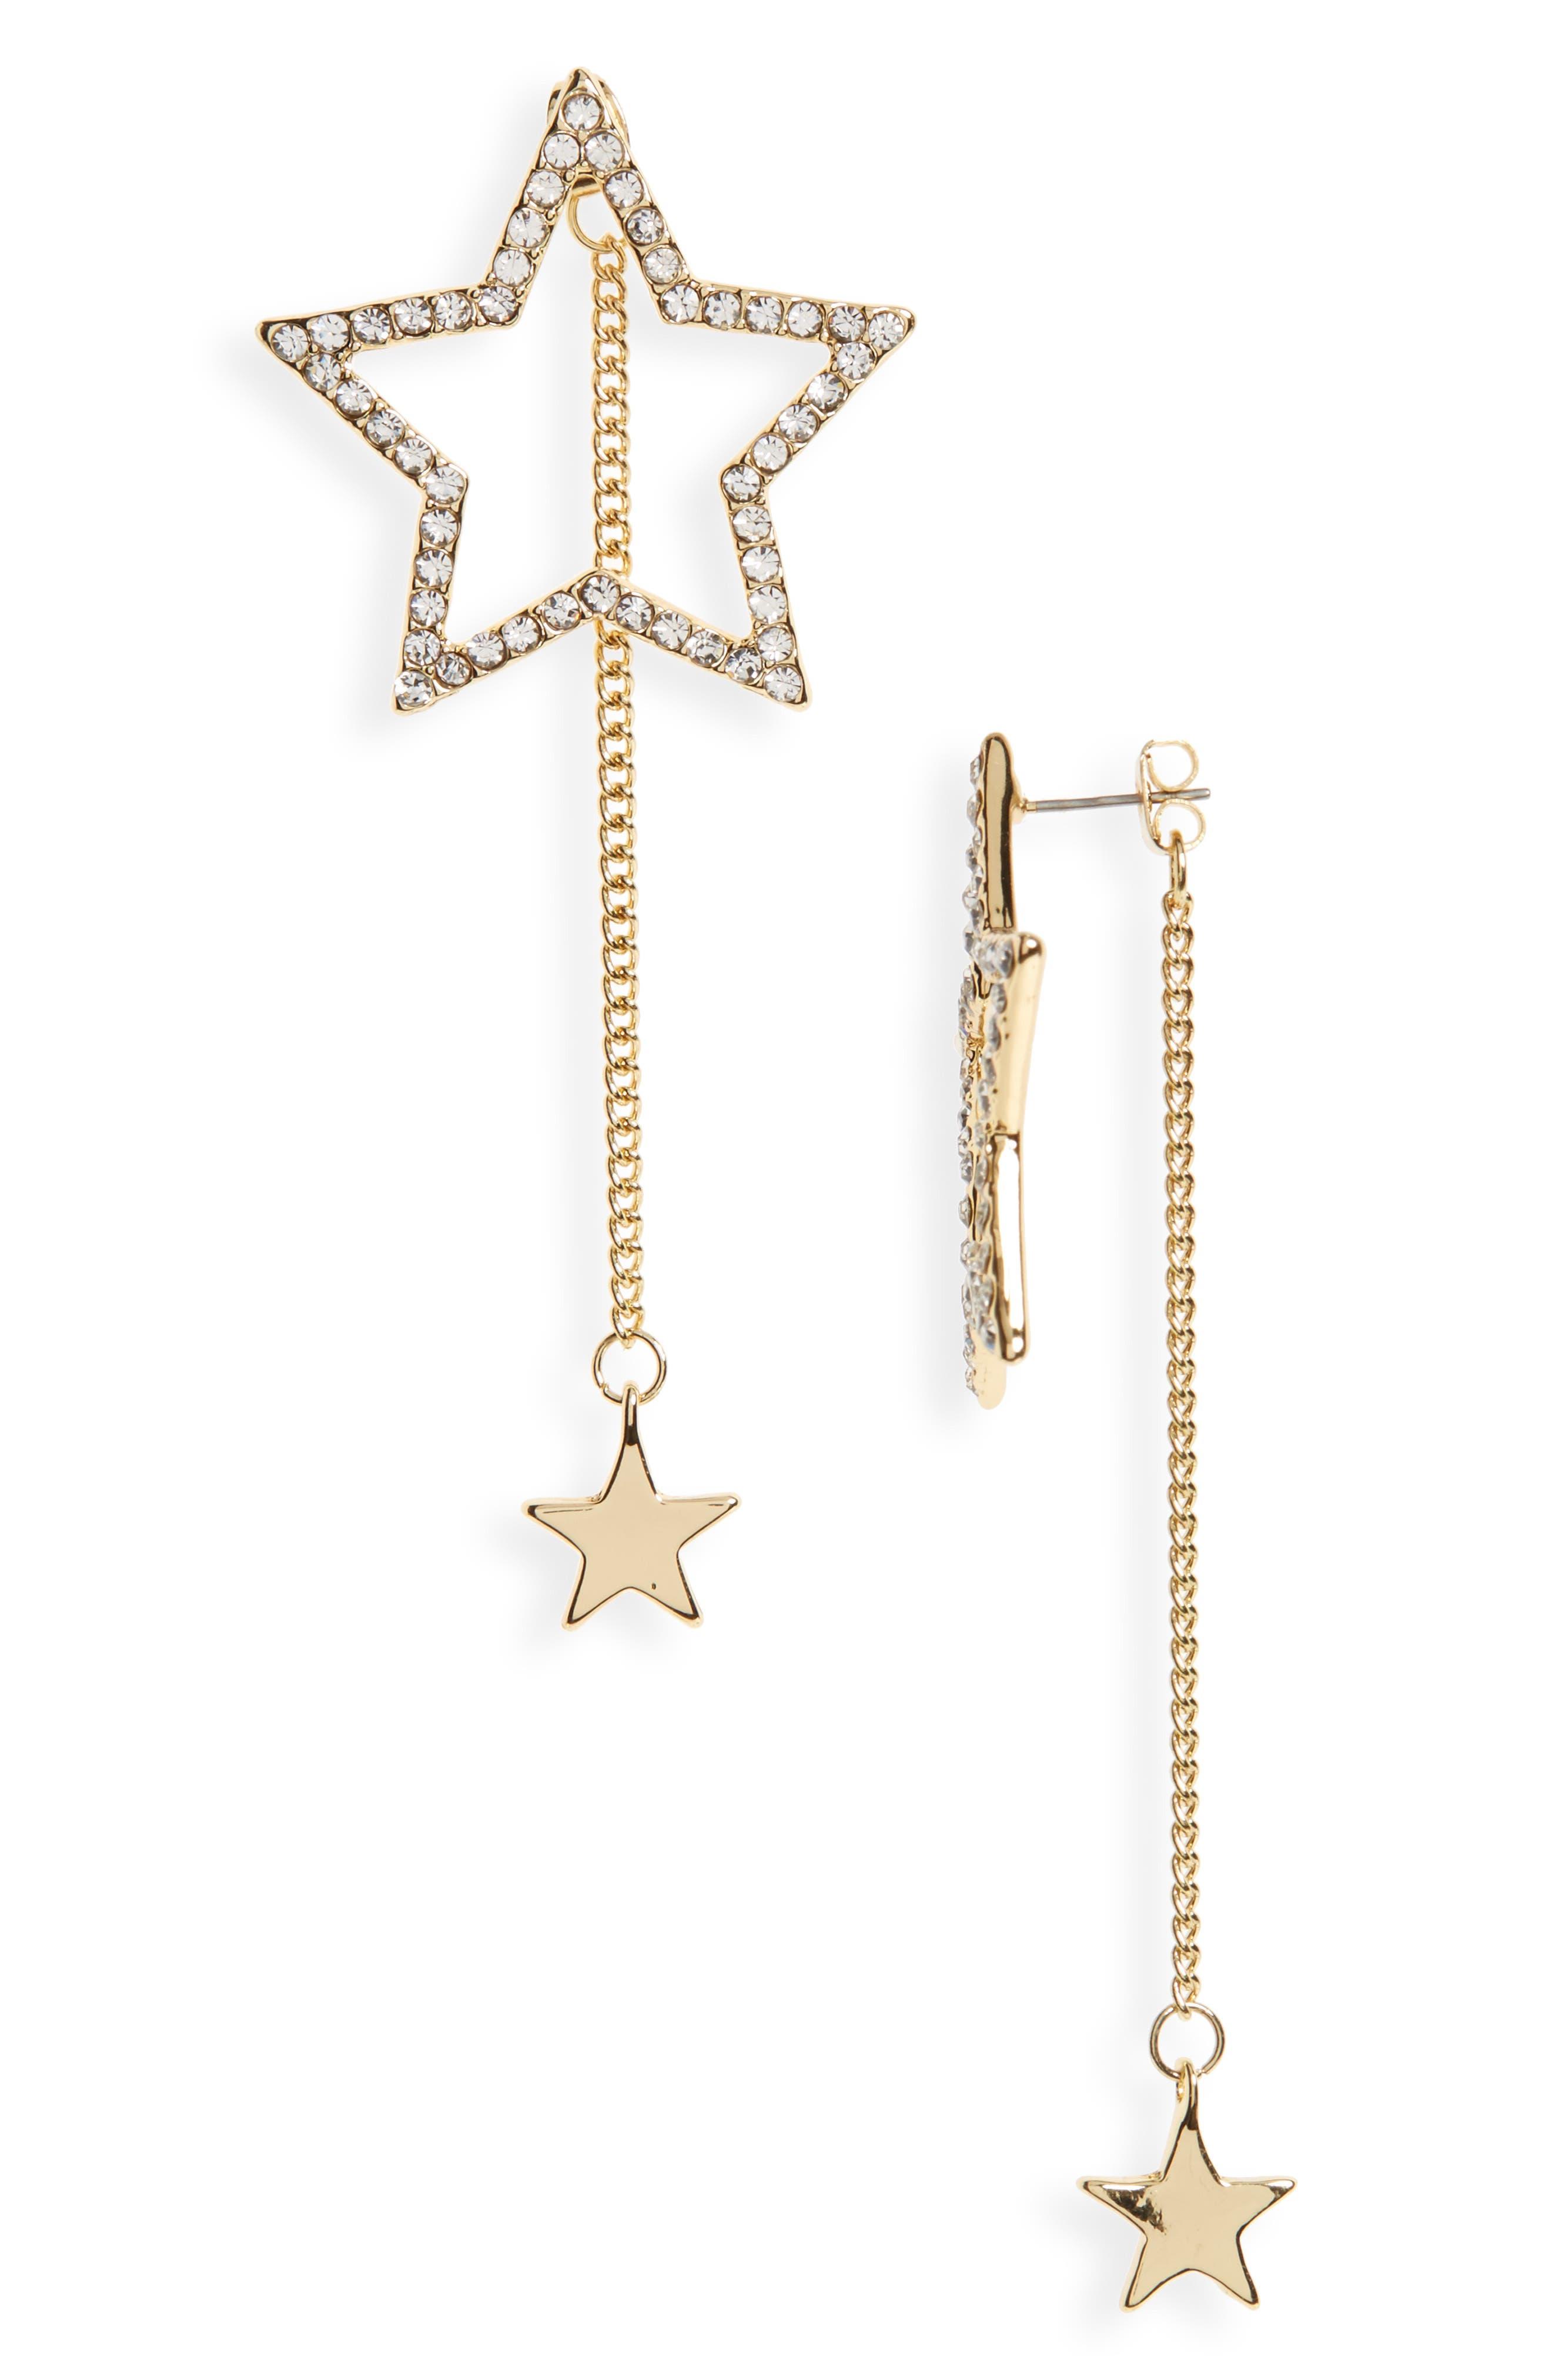 Main Image - Cara Large Star Statement Earrings